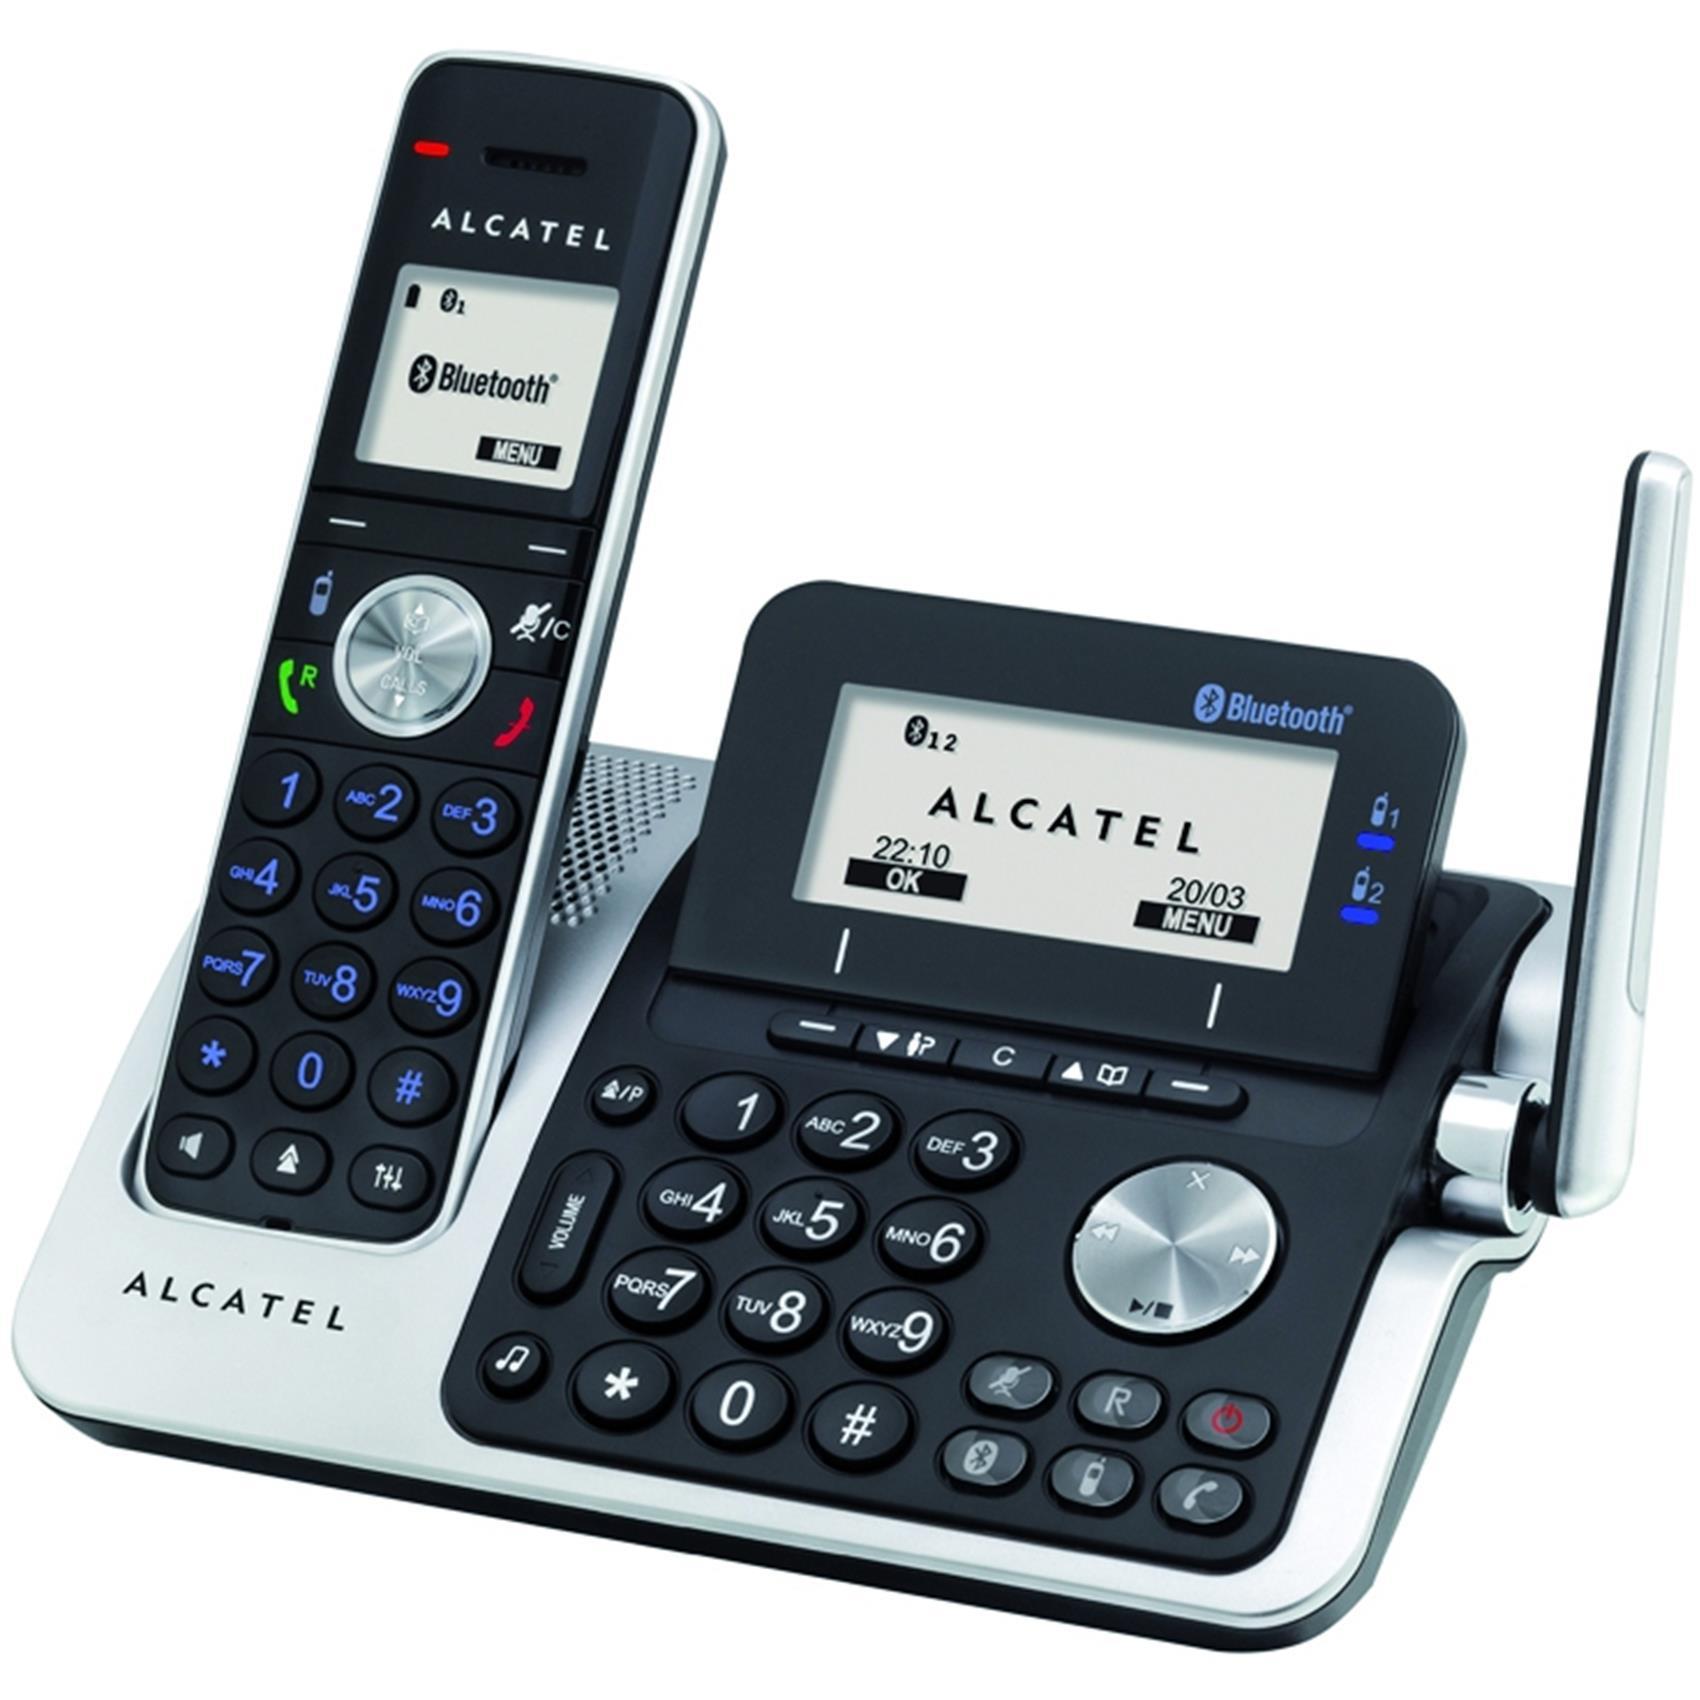 ALCATEL XP2050 B/T DECT PHONE